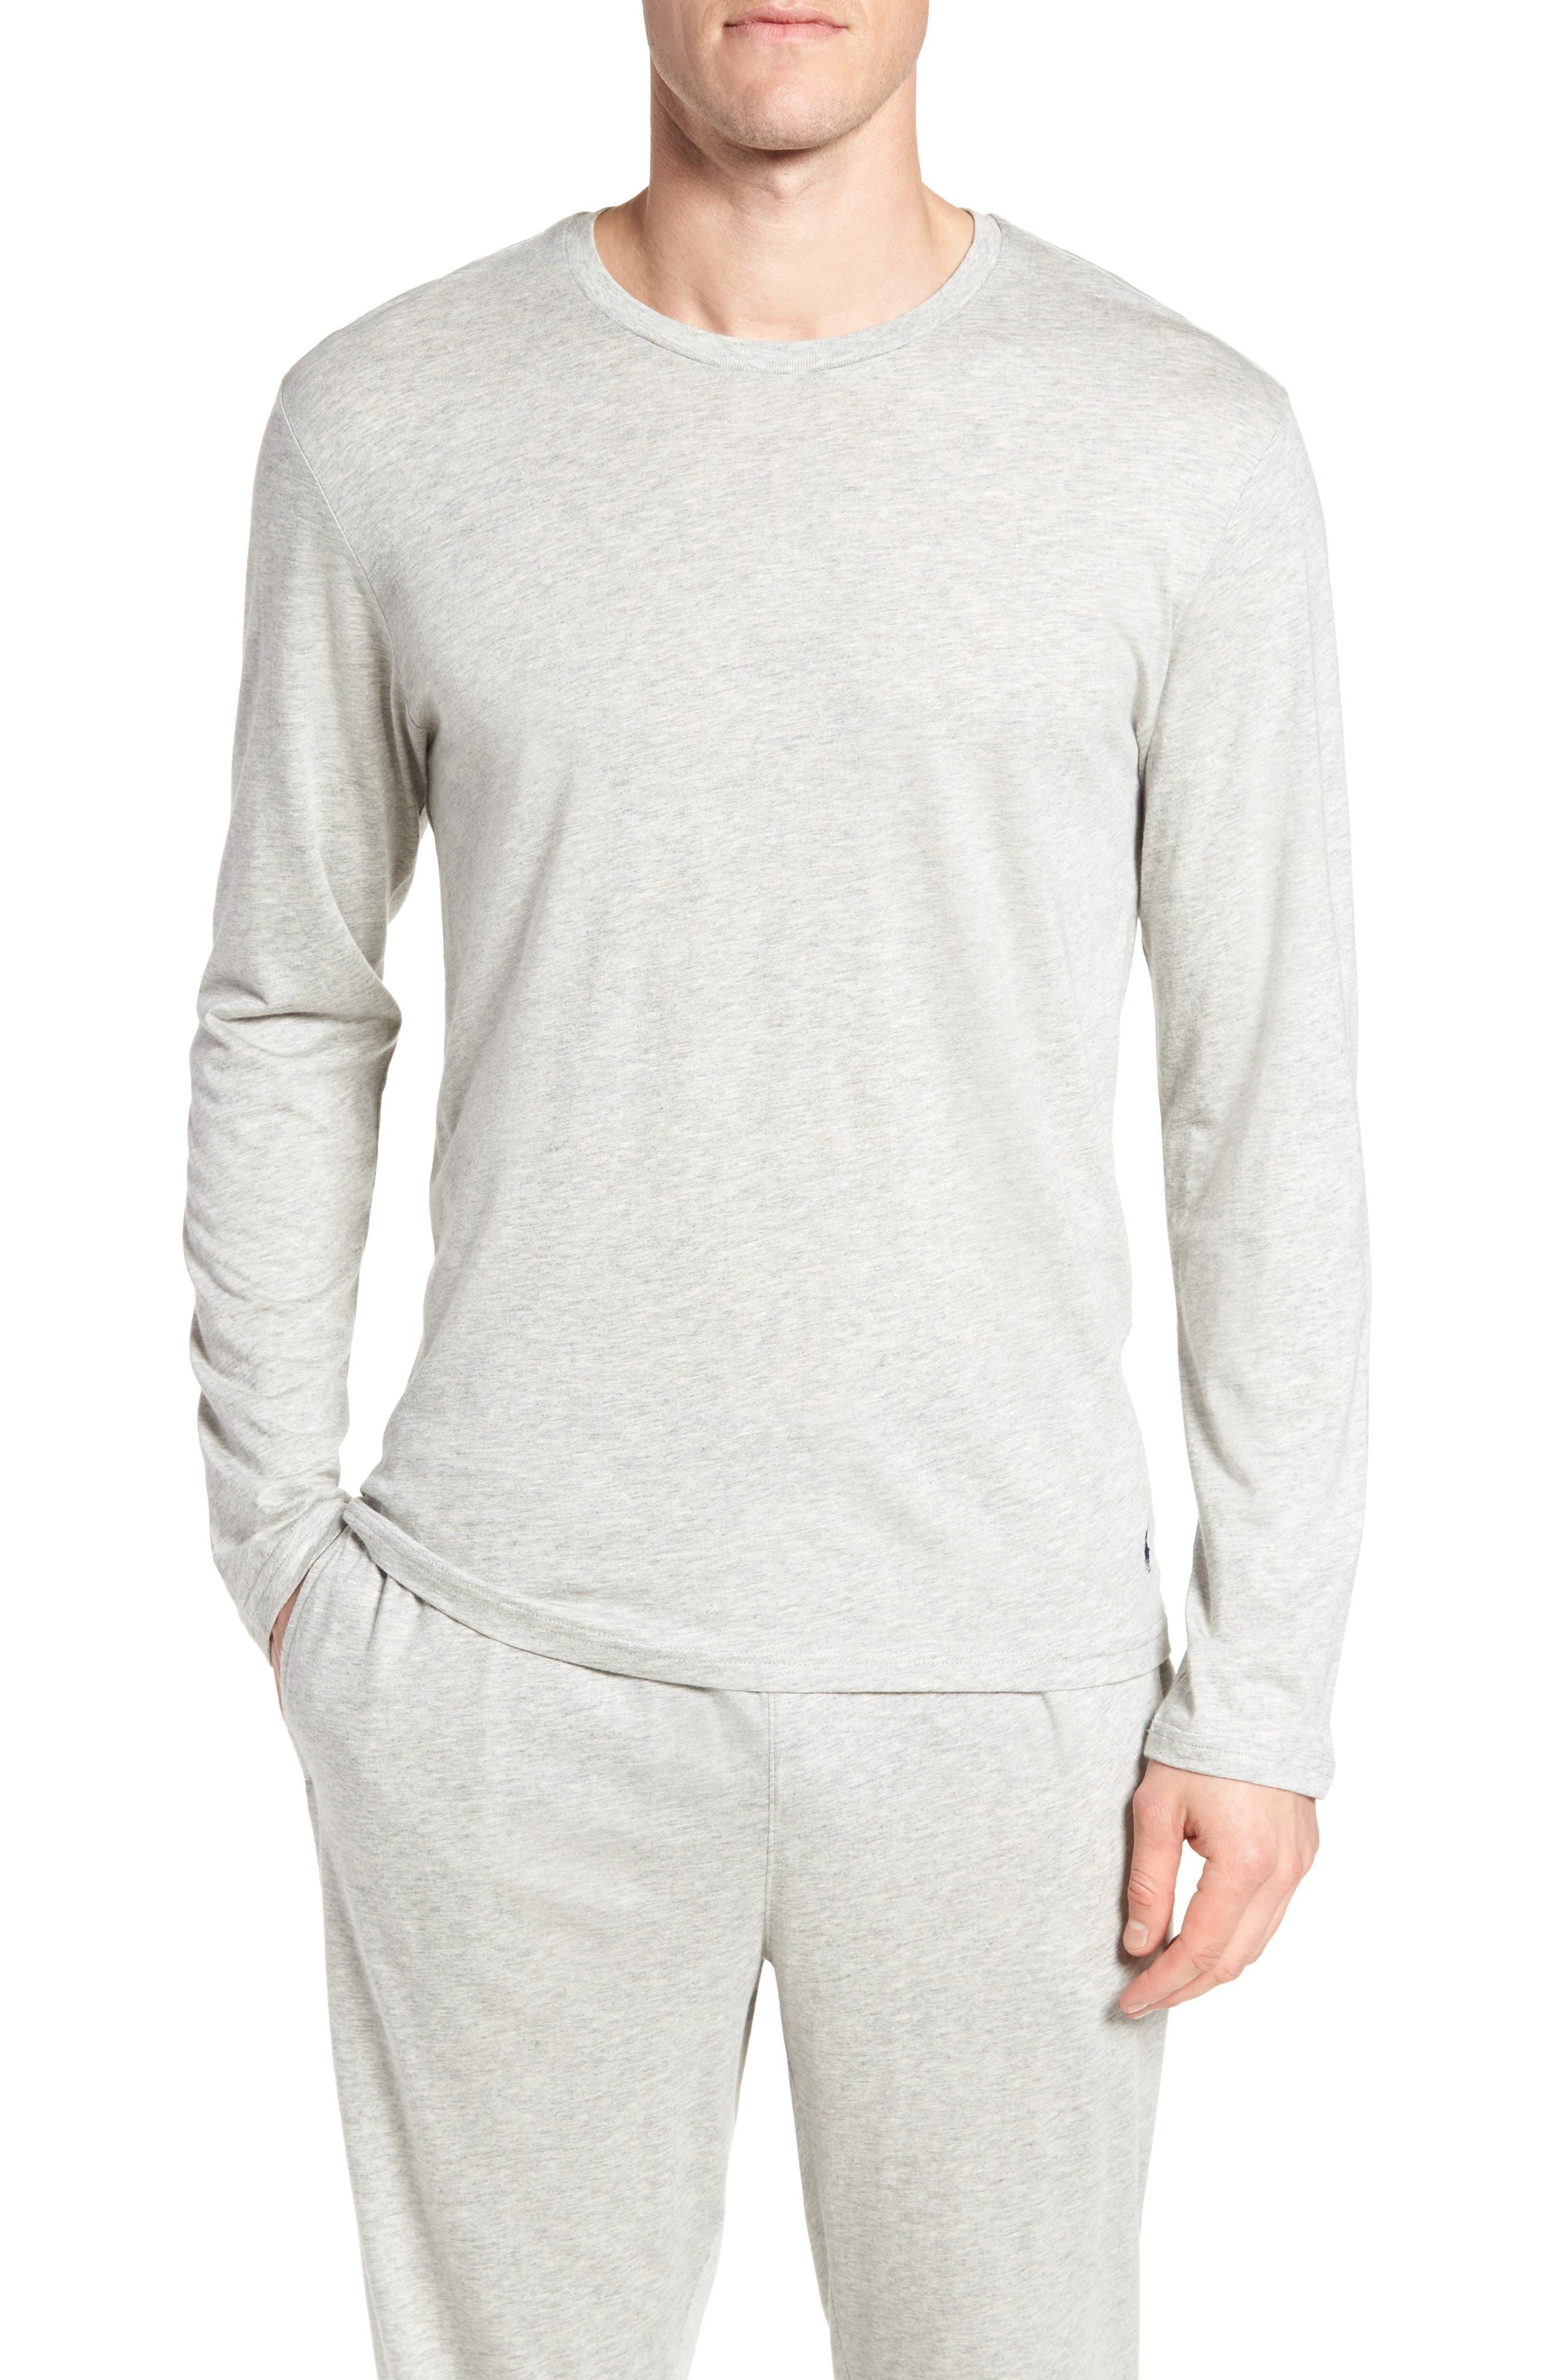 Polo Ralph Lauren Supreme Comfort Cotton & Modal T-Shirt